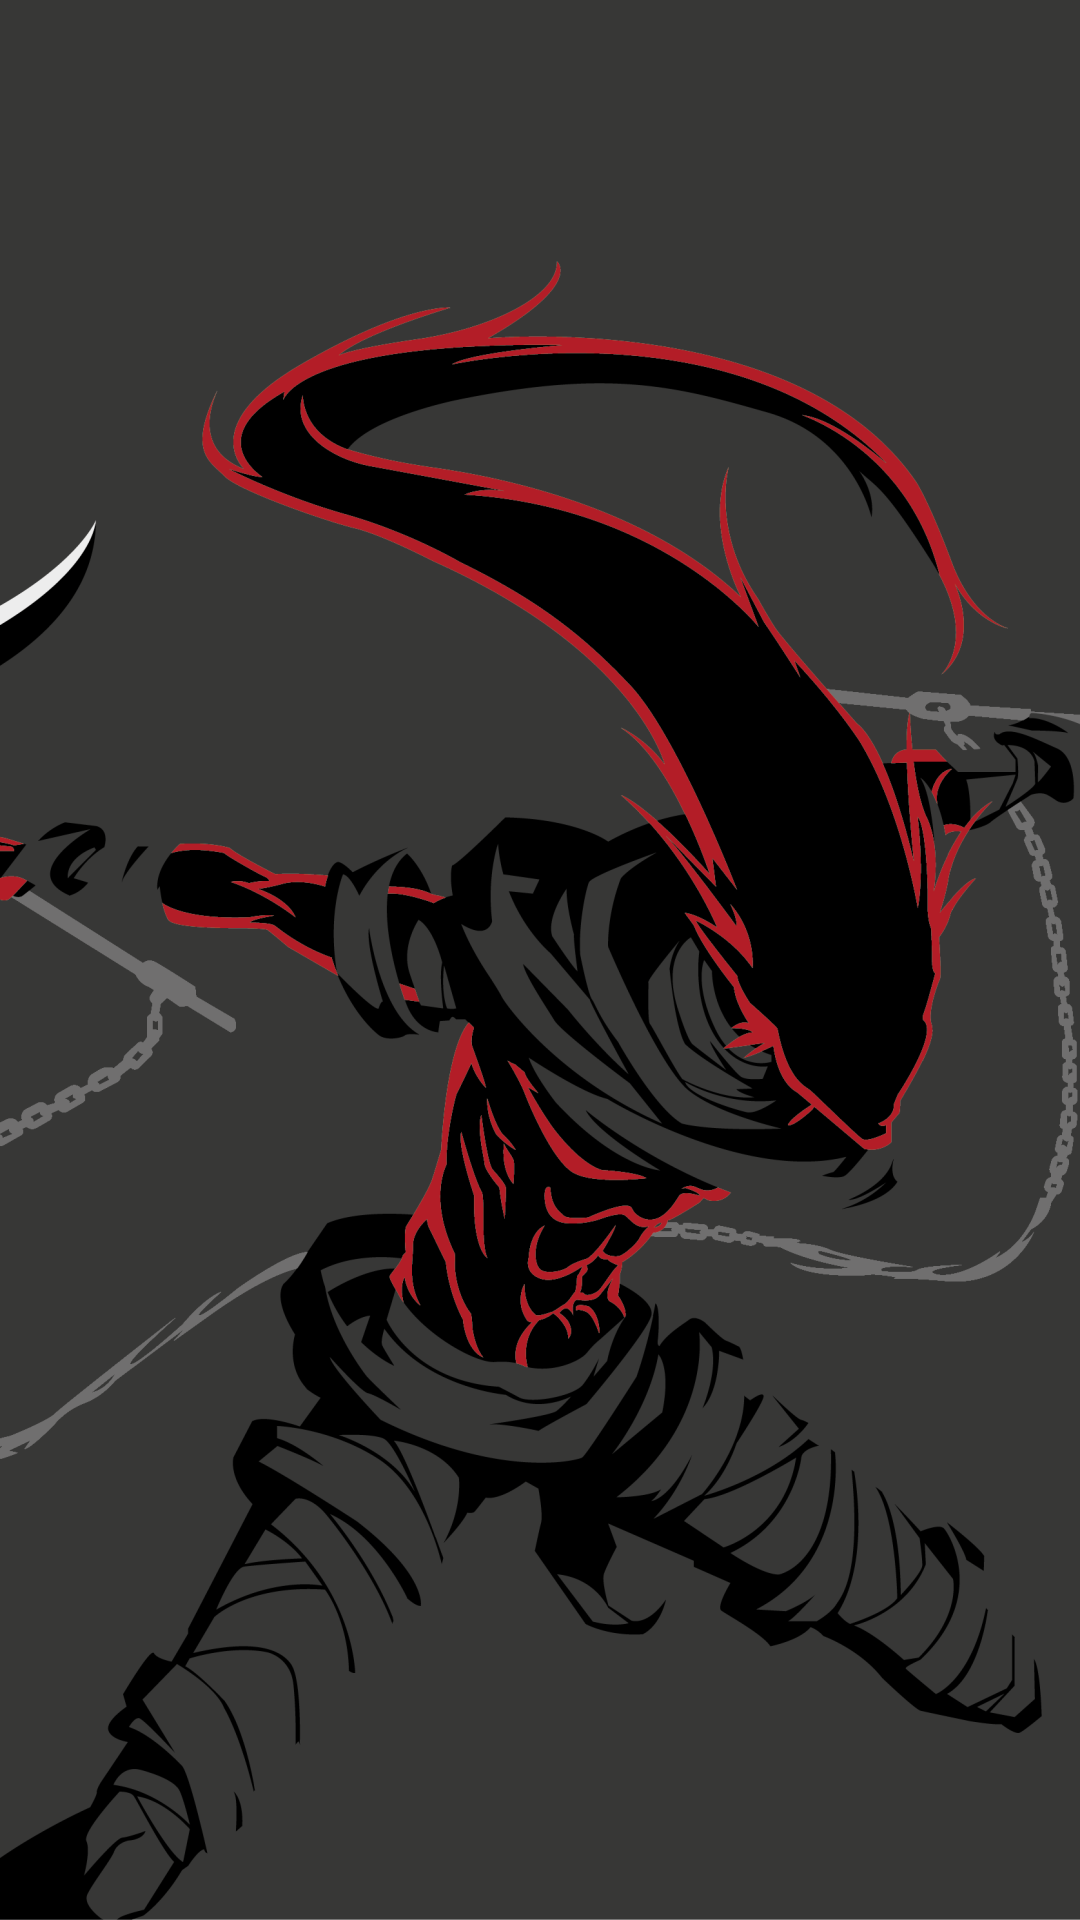 Anime / Bleach (1080x1920) Mobile Wallpaper